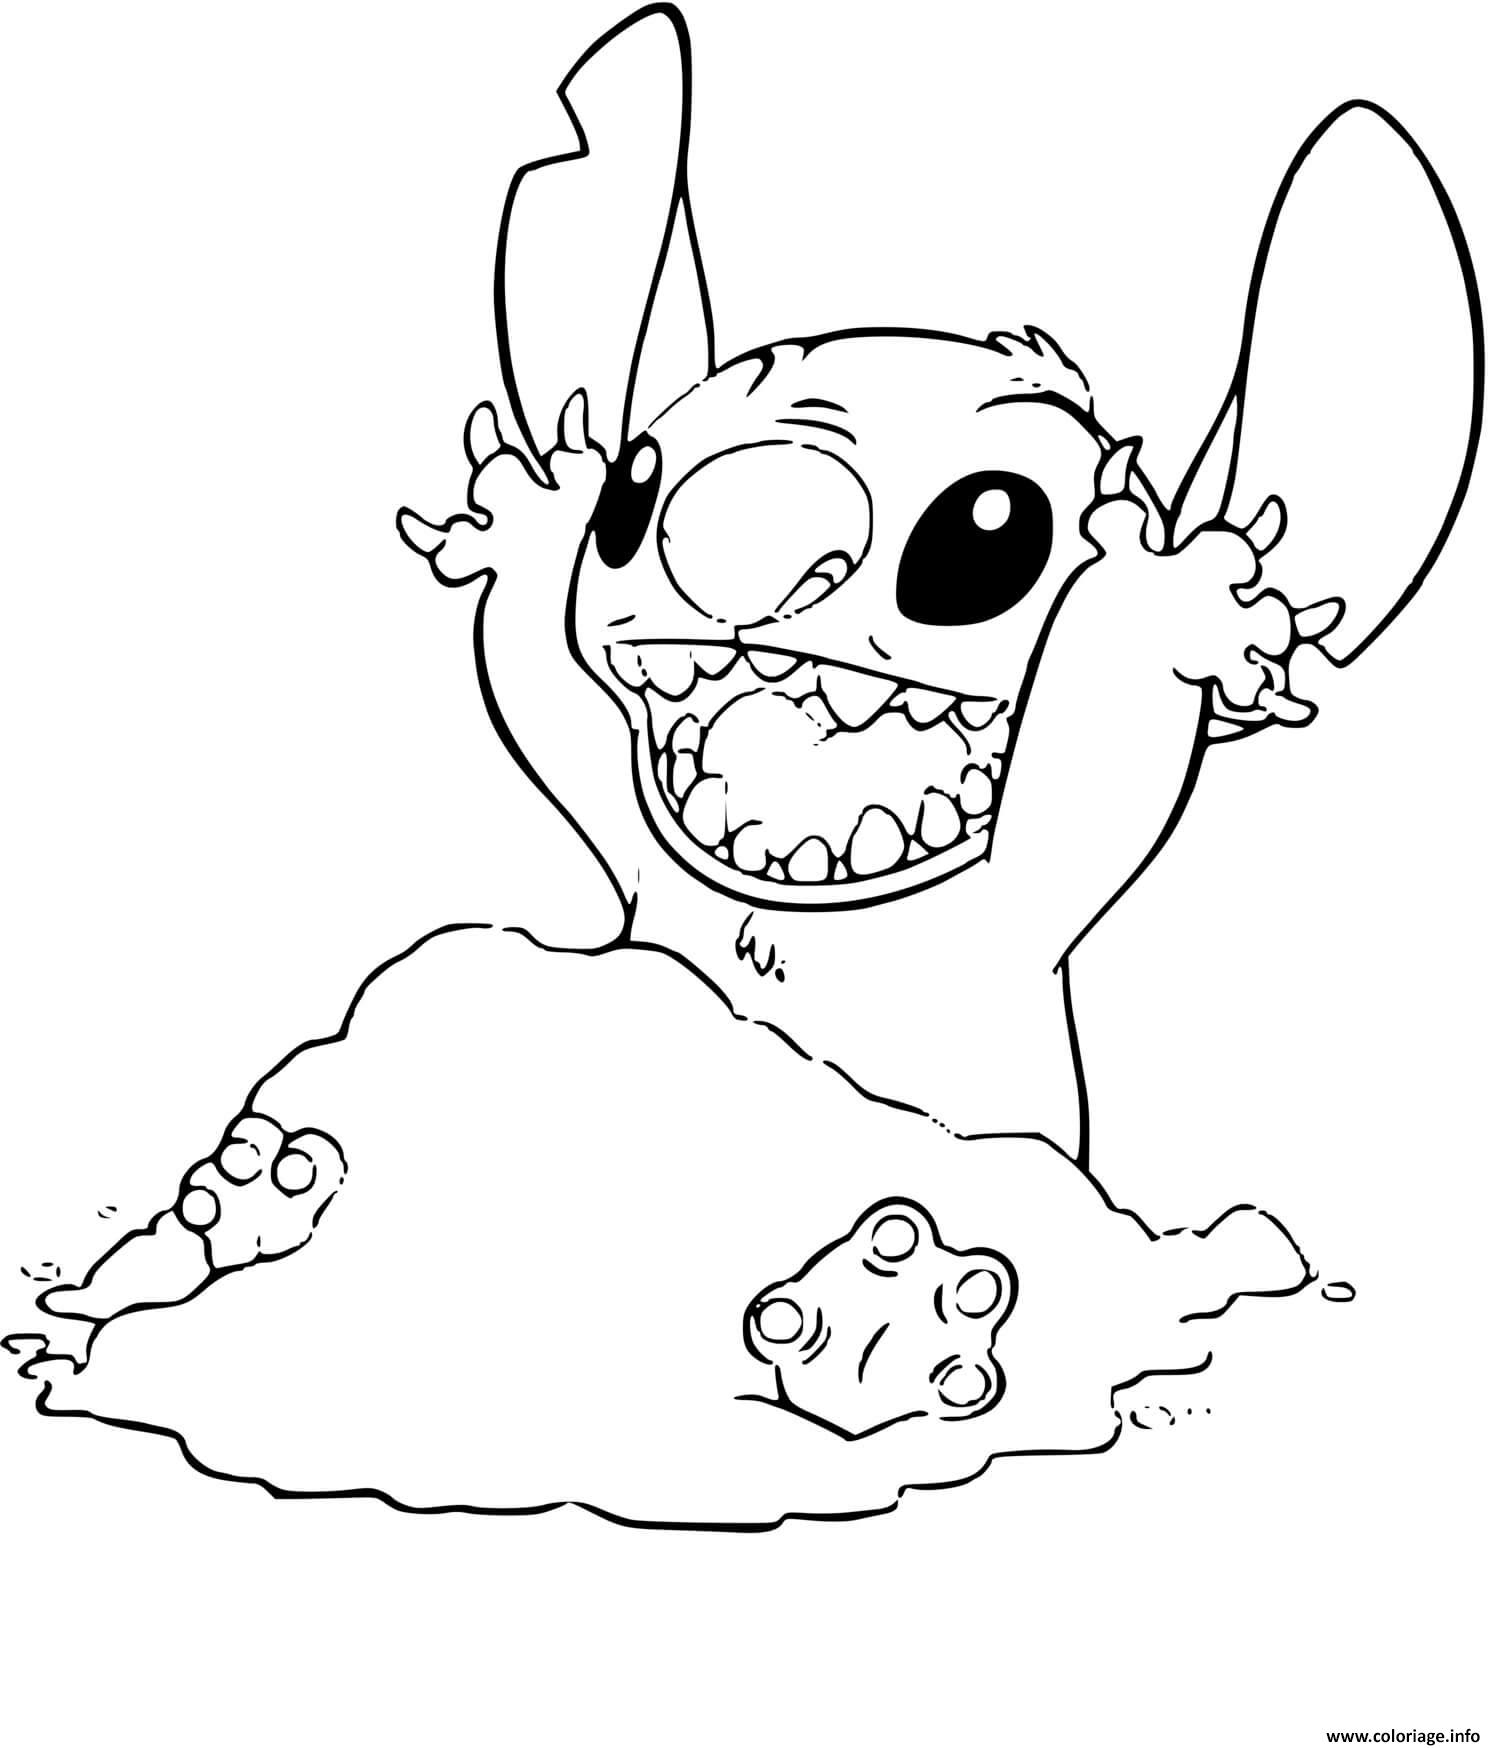 View 10 Dessin A Imprimer Disney Stitch Mignon - gettyfarinterest